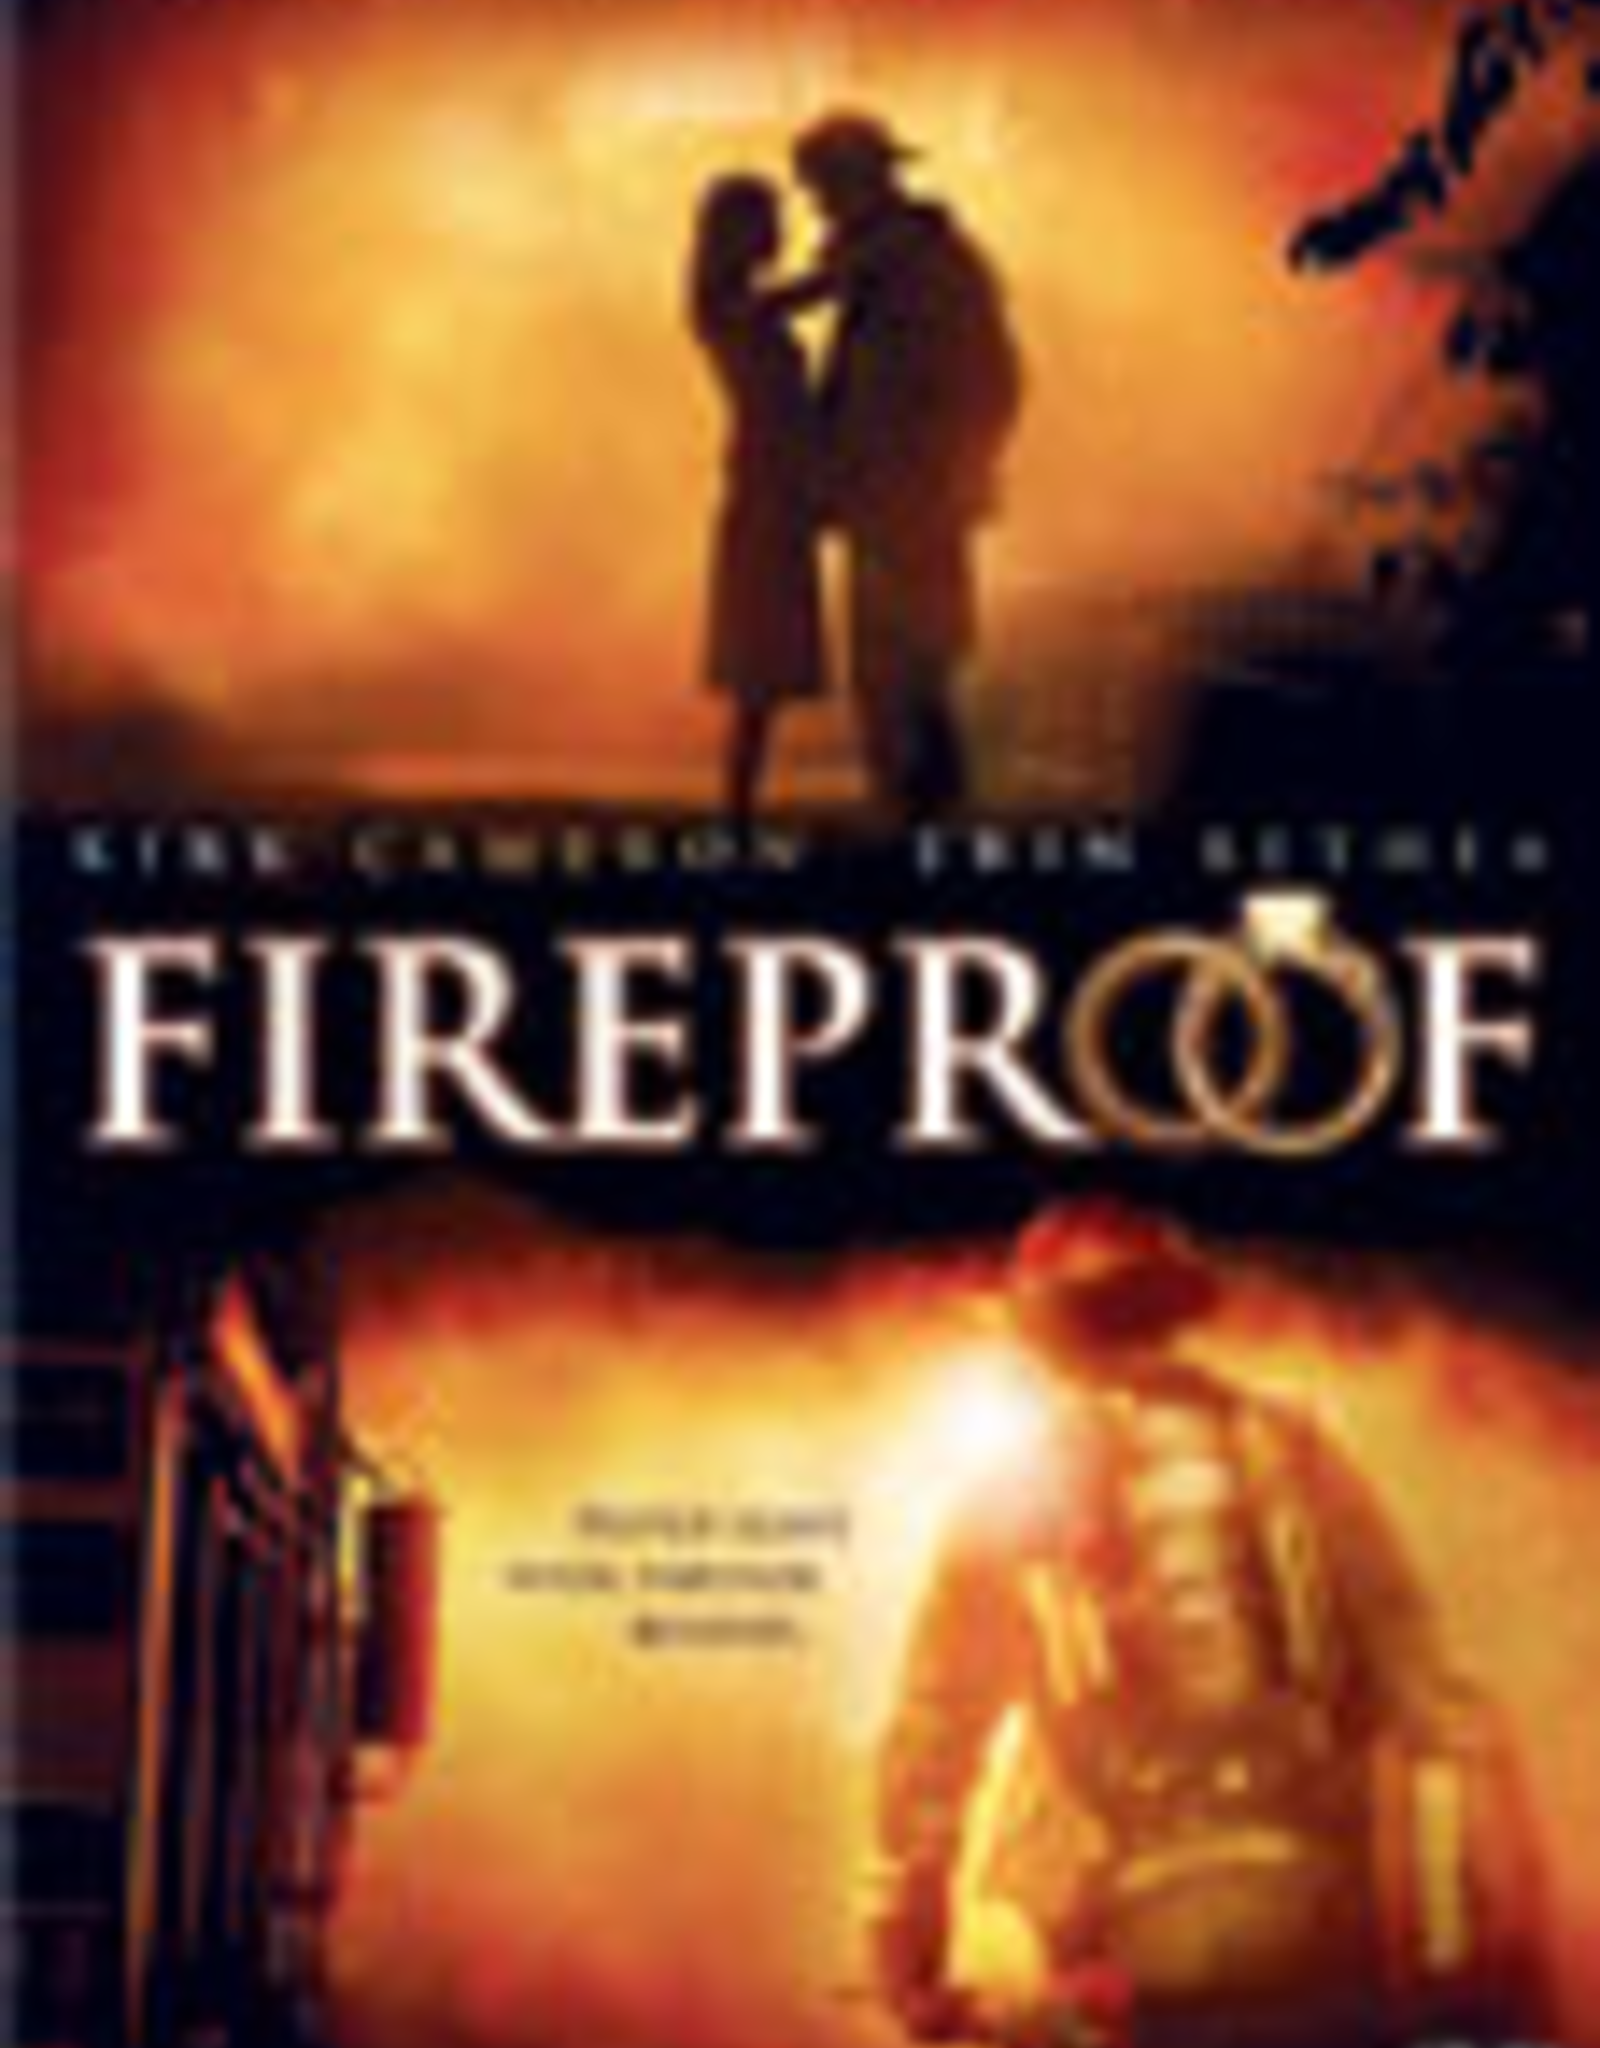 Ignatius Press Fireproof (DVD)